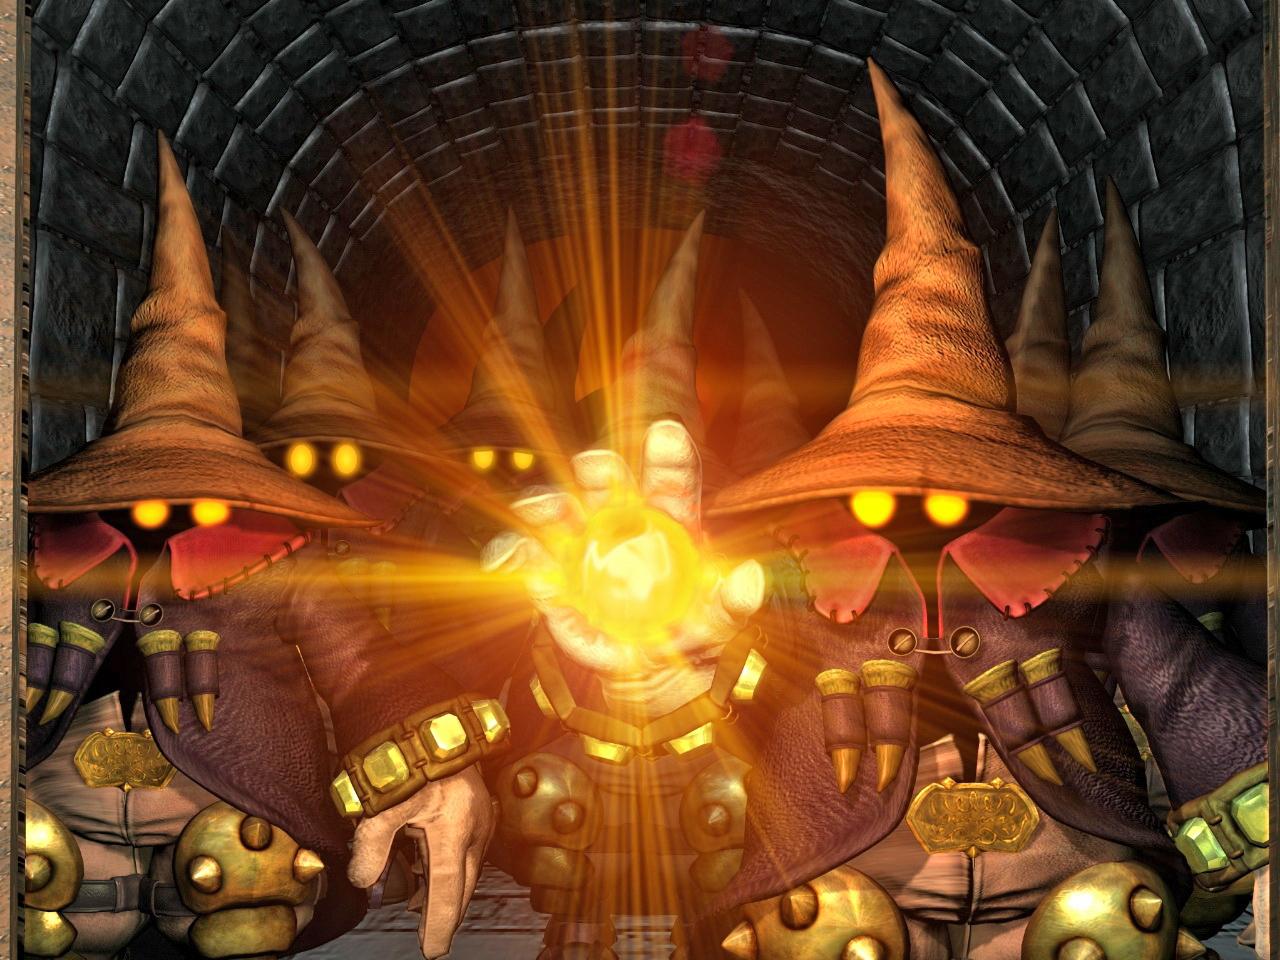 Final Fantasy IX PC mod adds high-def background art